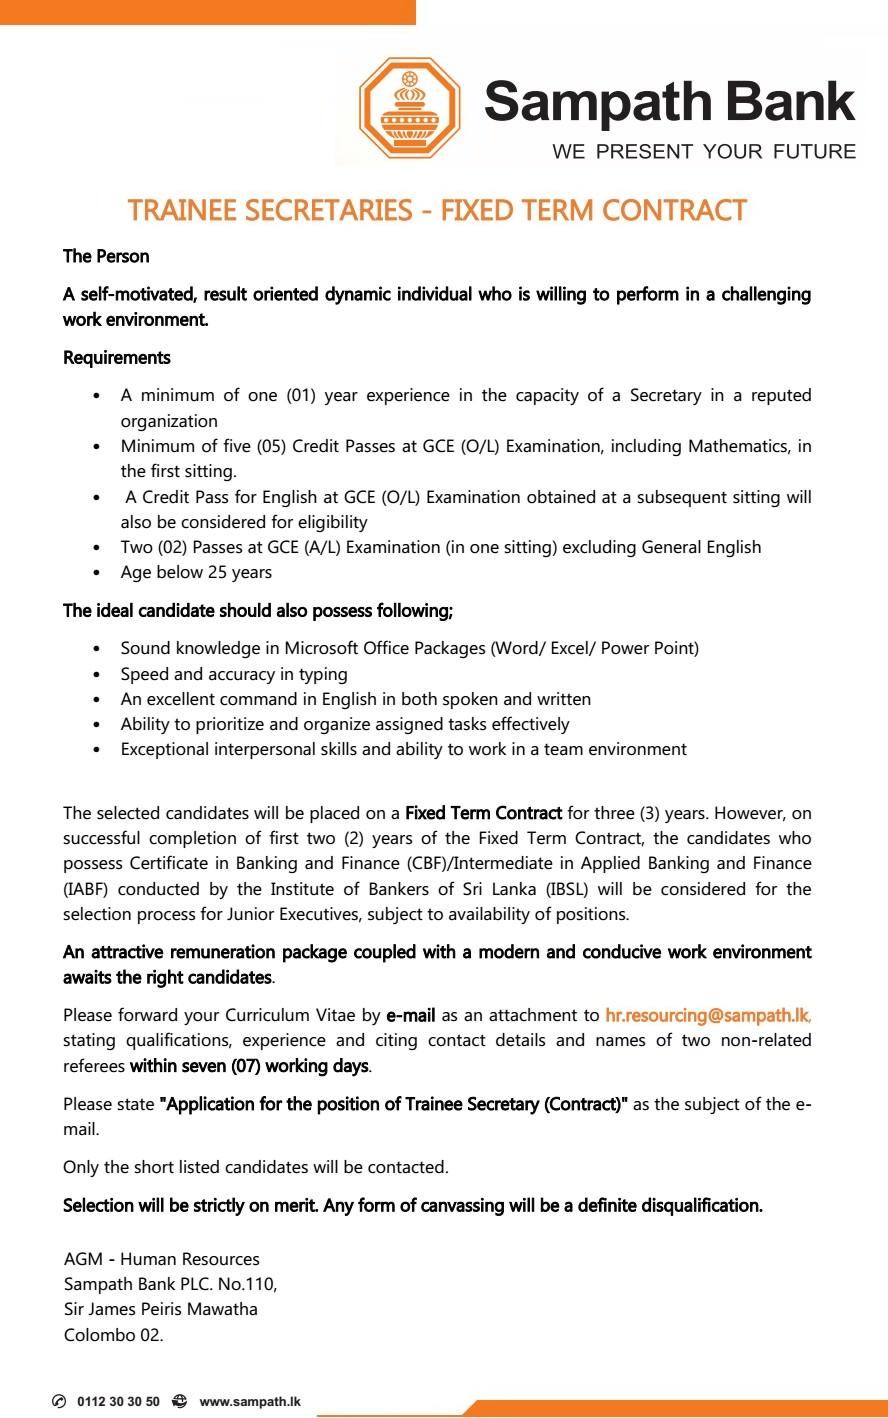 Trainee Secretaries - Sampath Bank PLC - Job Vacancies ...